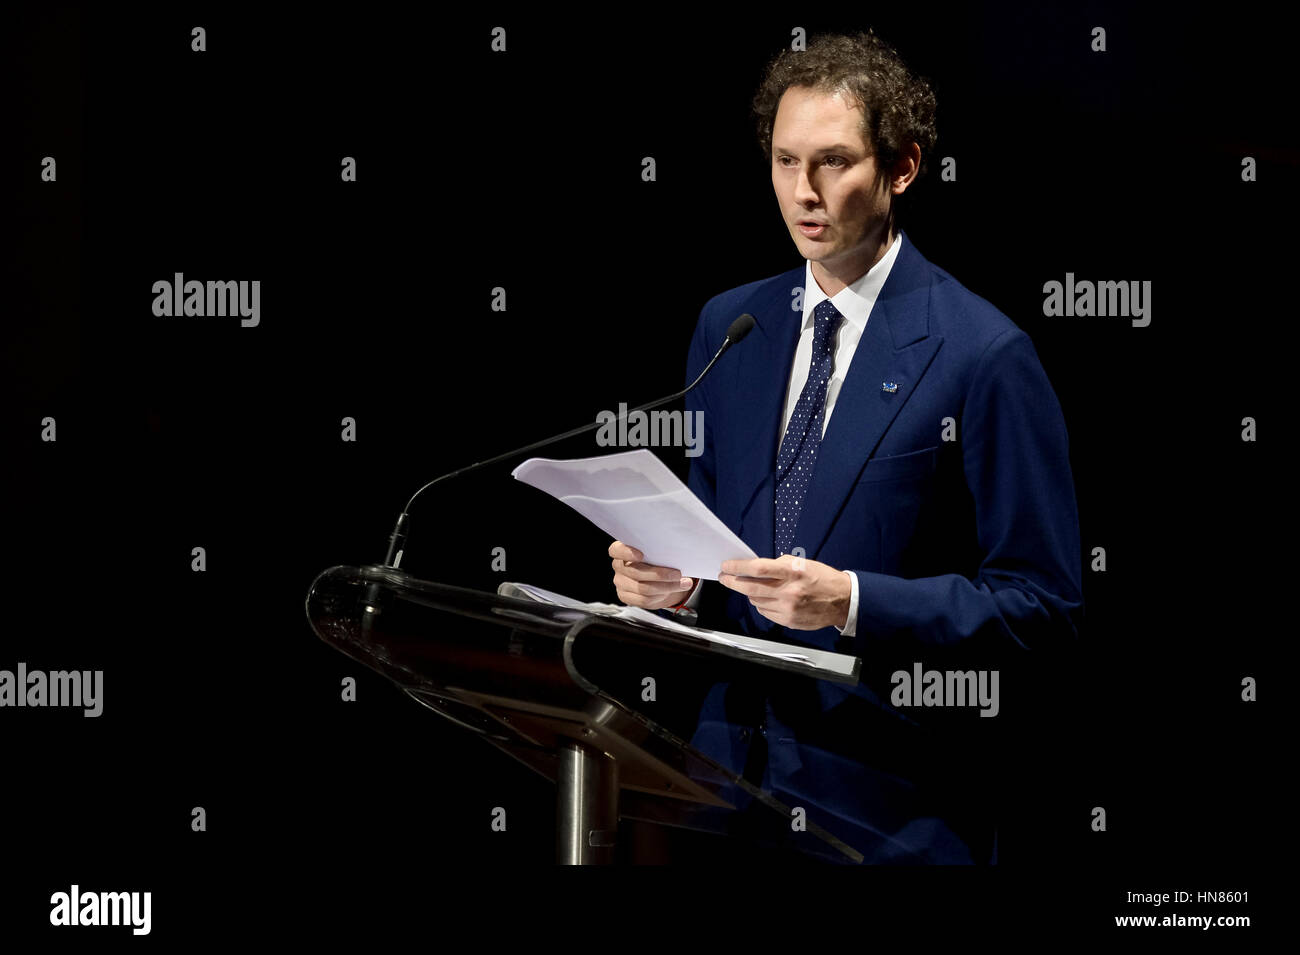 Turin, Italy. 2017, 9 february: John Philip Jacob Elkann, Italian businessman and chairman of Italiana Editrice Stock Photo